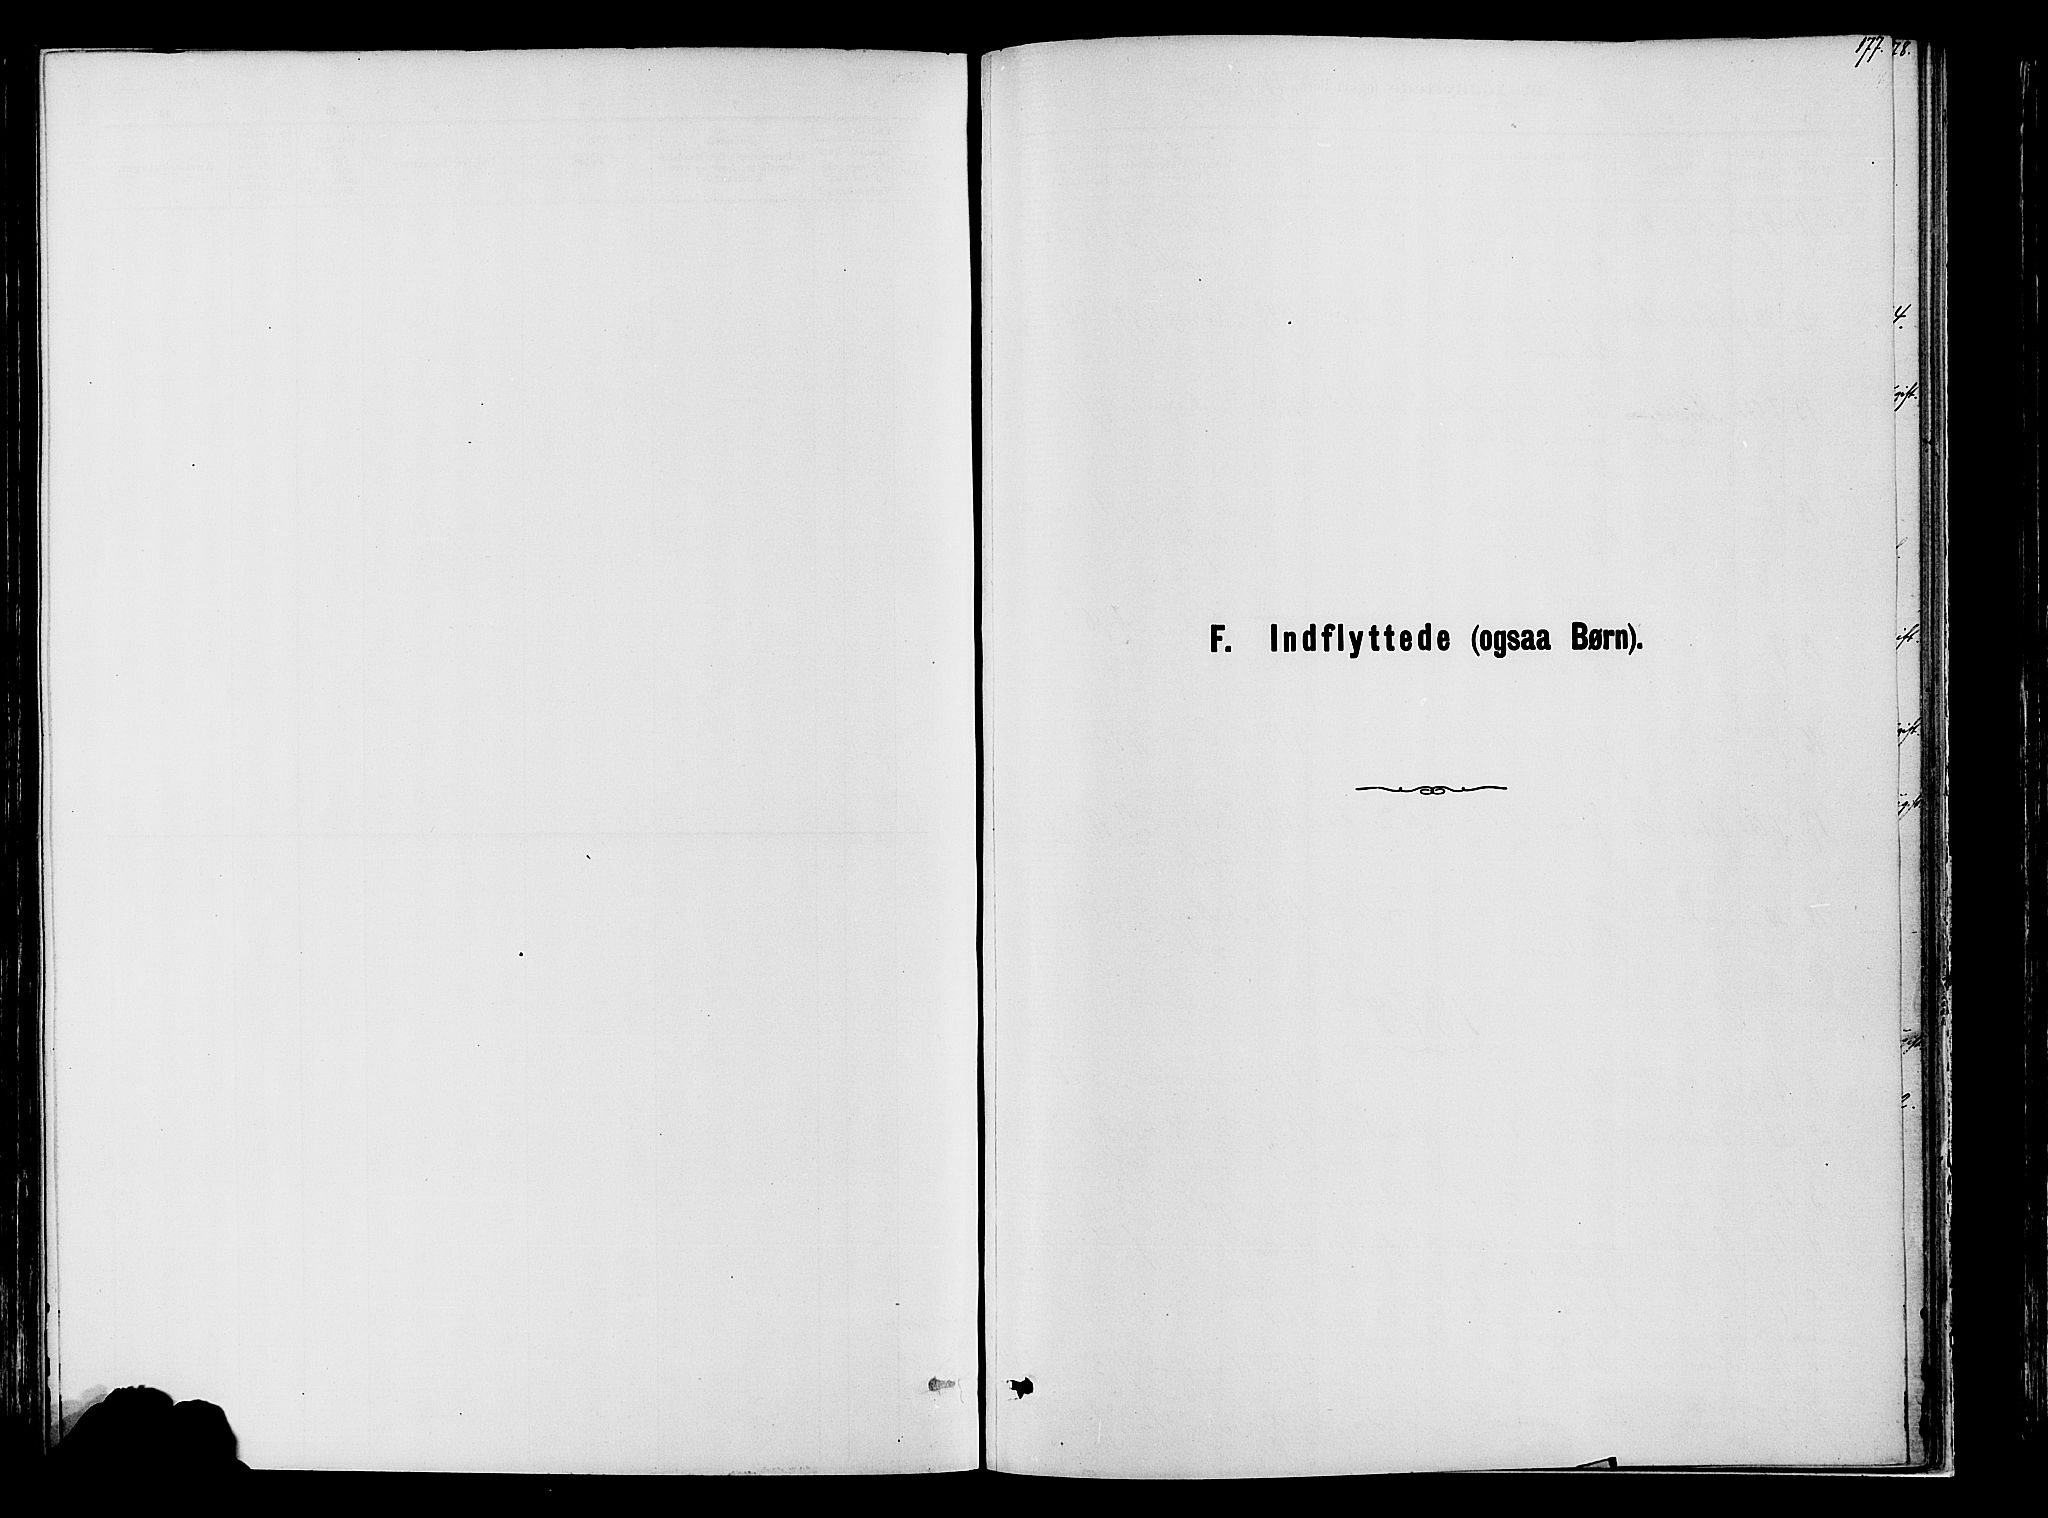 SAH, Vardal prestekontor, H/Ha/Haa/L0009: Ministerialbok nr. 9, 1878-1892, s. 177